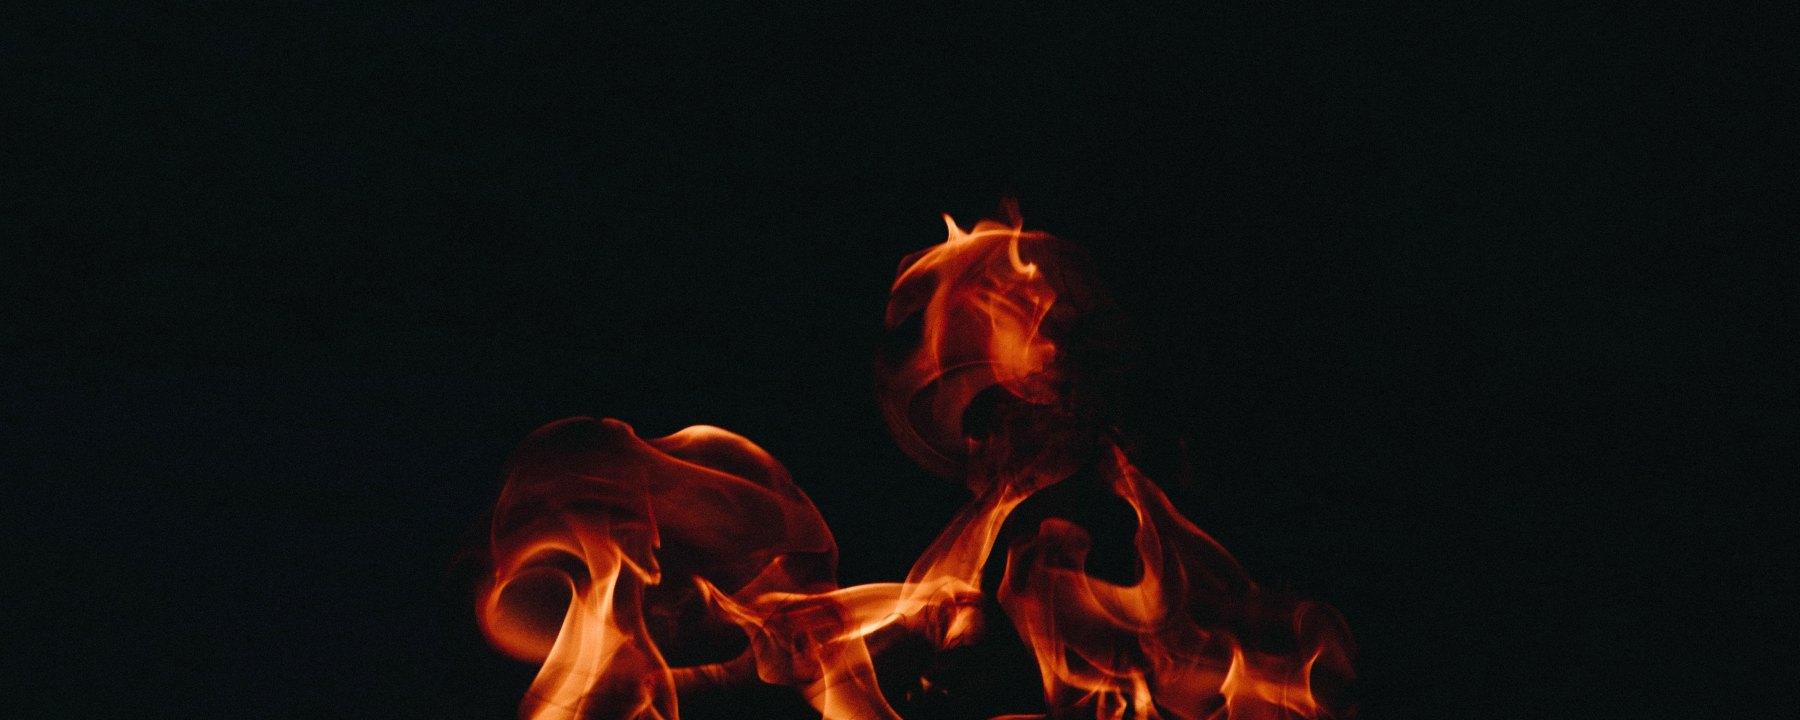 fire, Holy Spirit, Pentecost, piety, flame